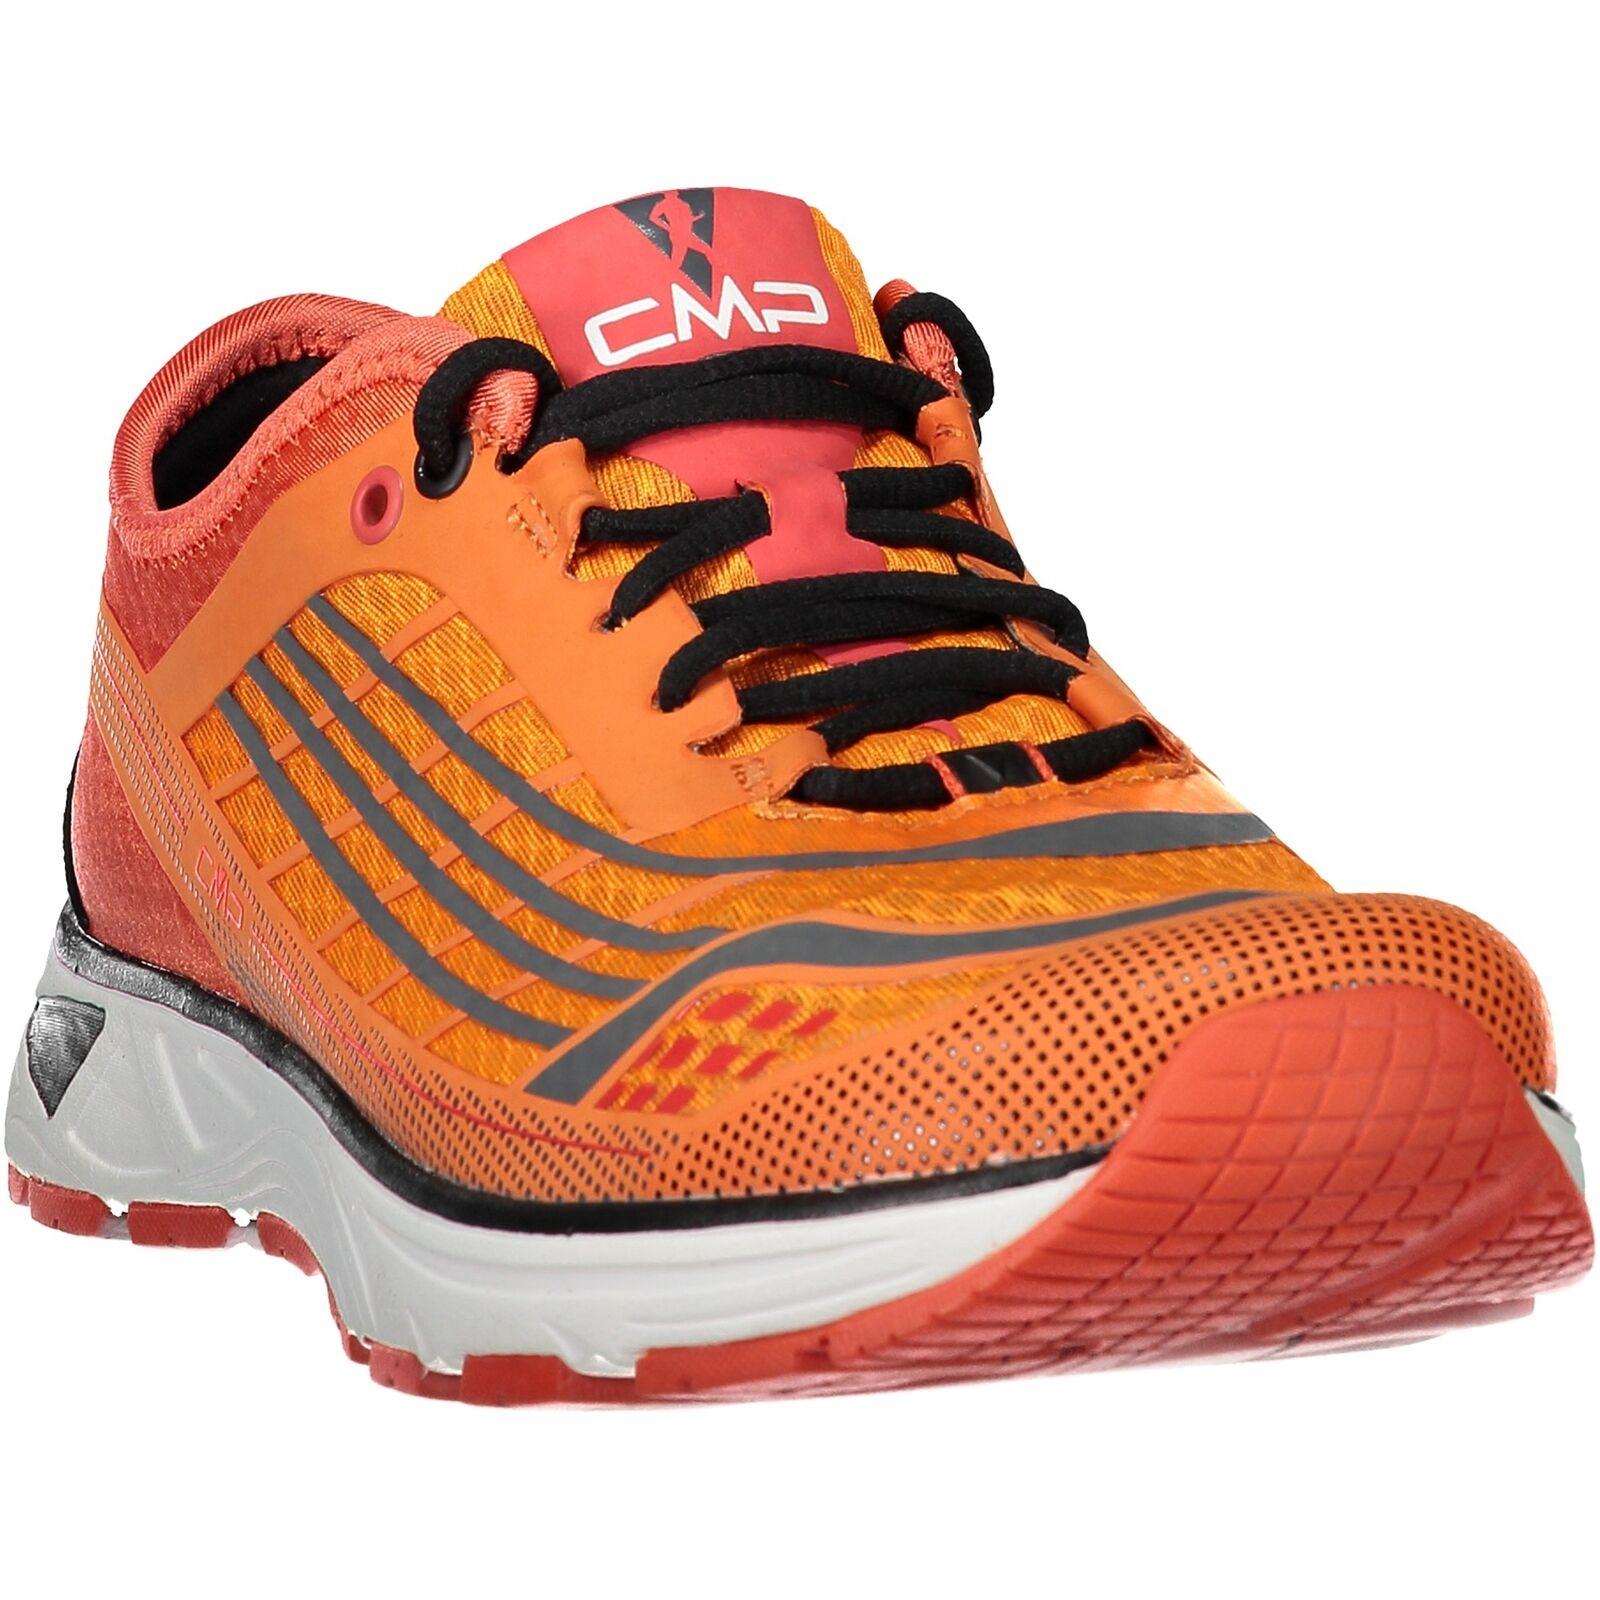 CMP Running Sports shoes Libre  Running shoes orange Plain Colour Mesh  cheap and fashion